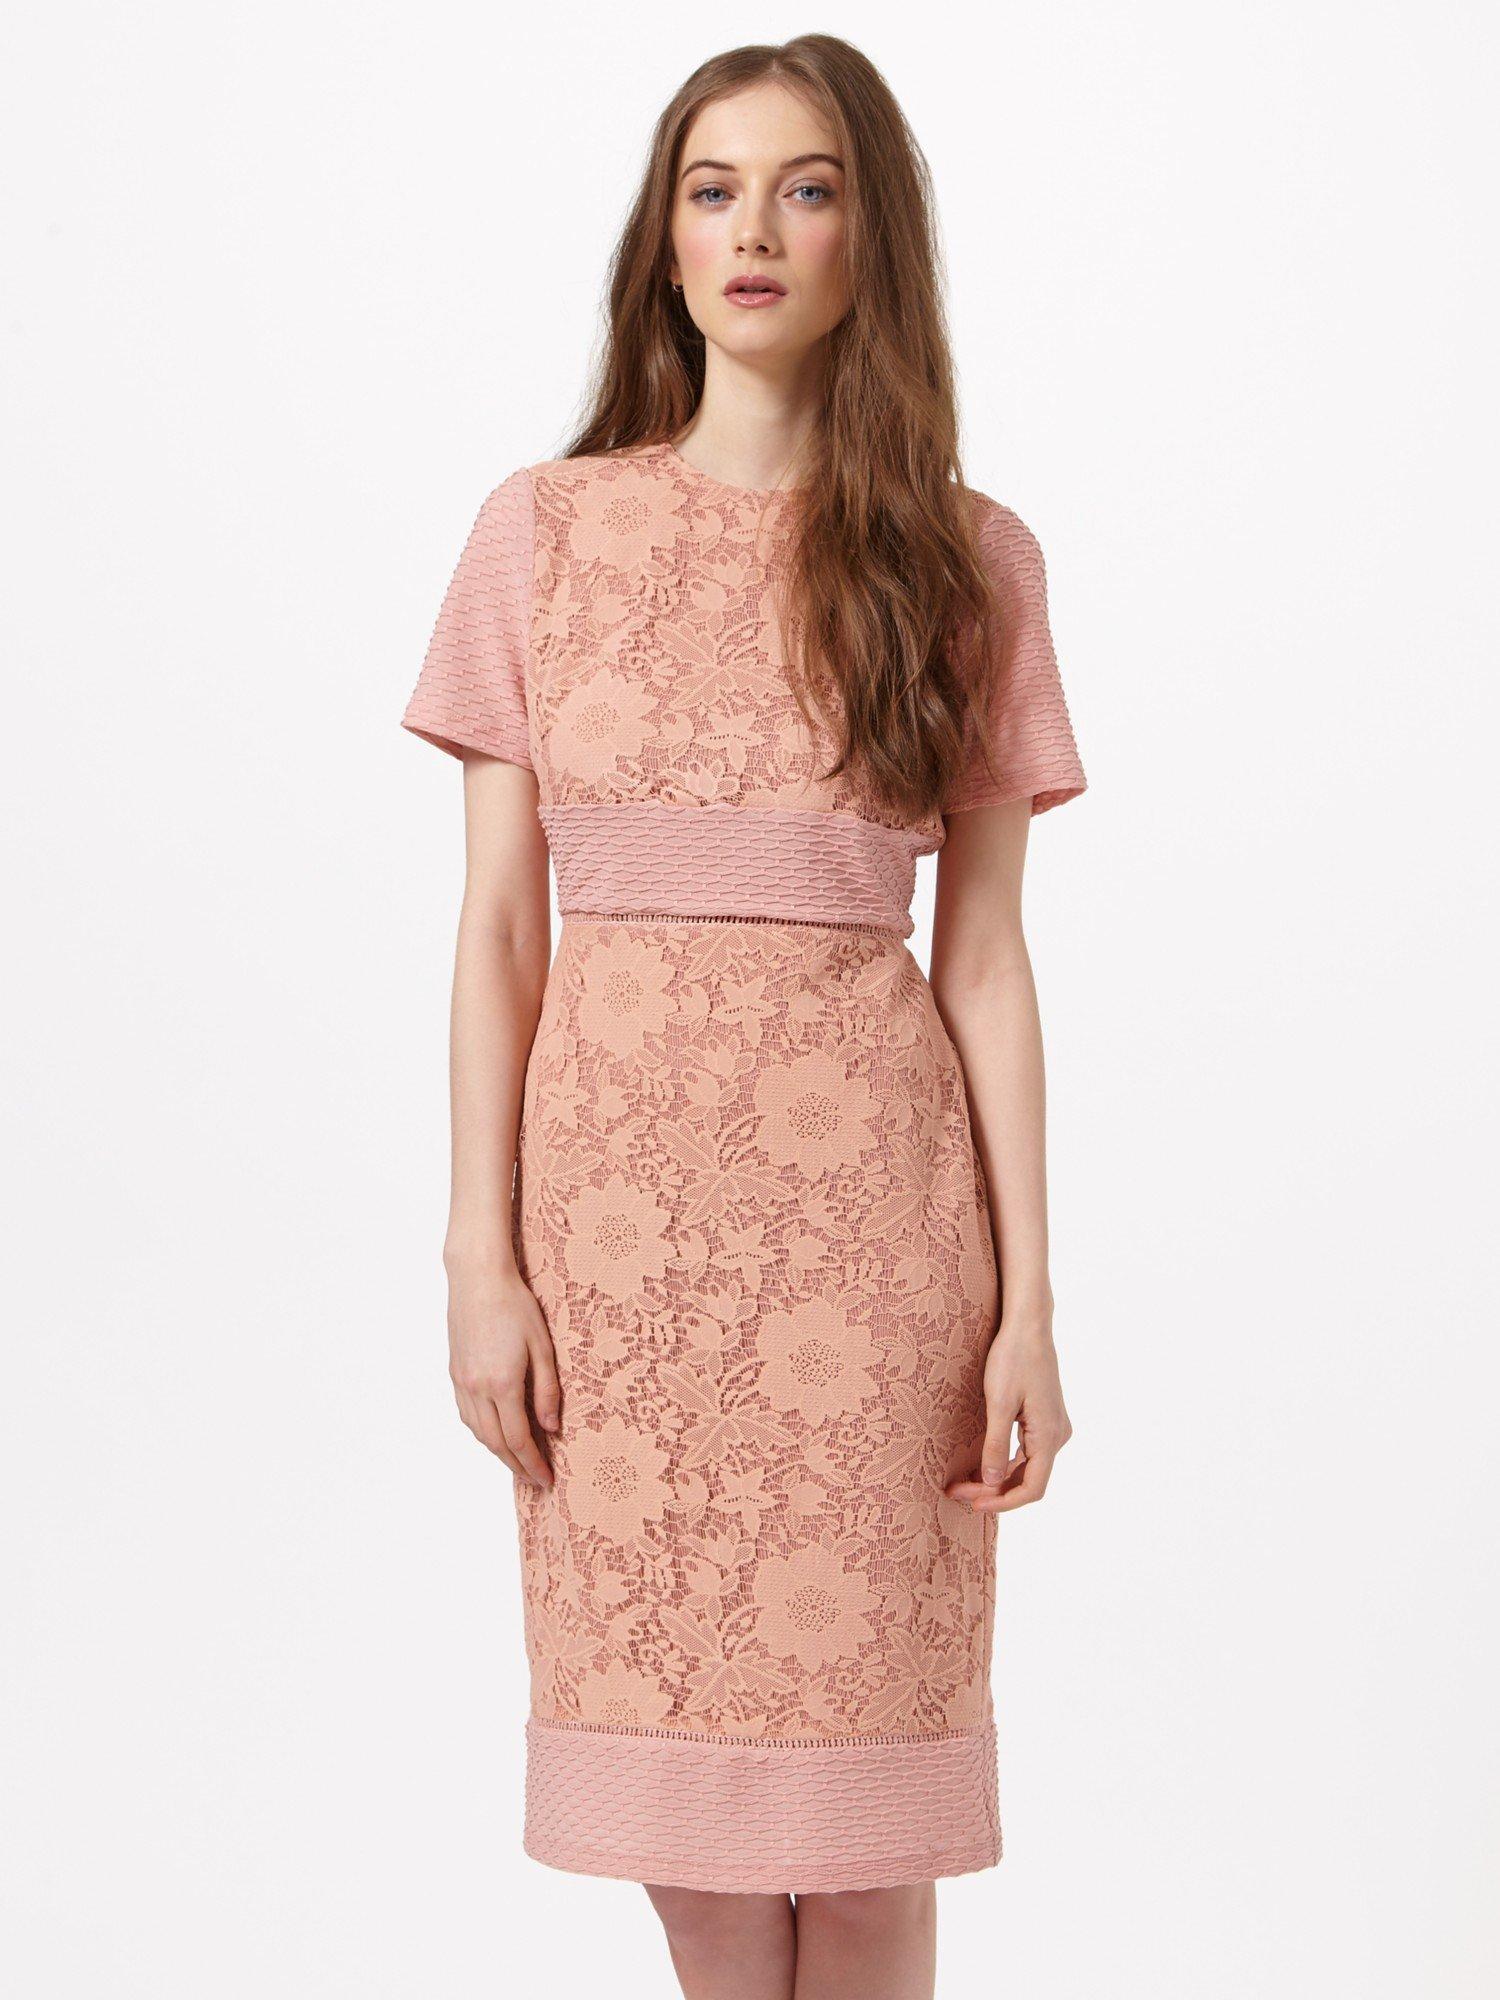 Lace-panelled pencil dress